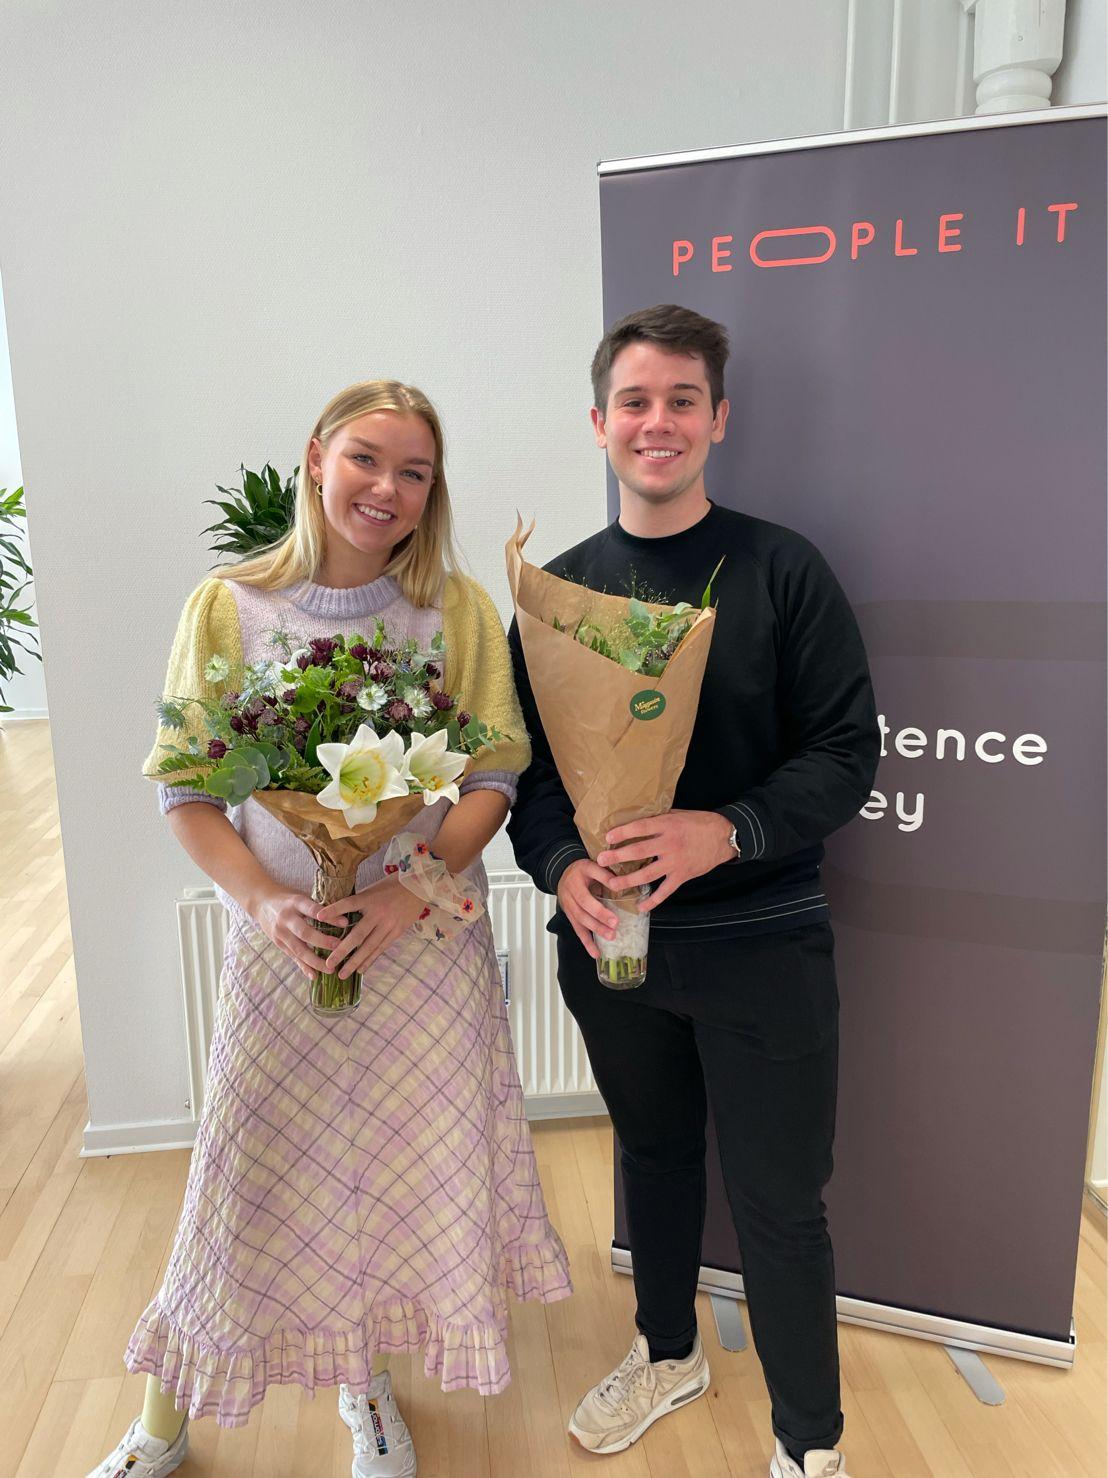 Sarah og Asger. Freelance IT-konsulent. People-IT